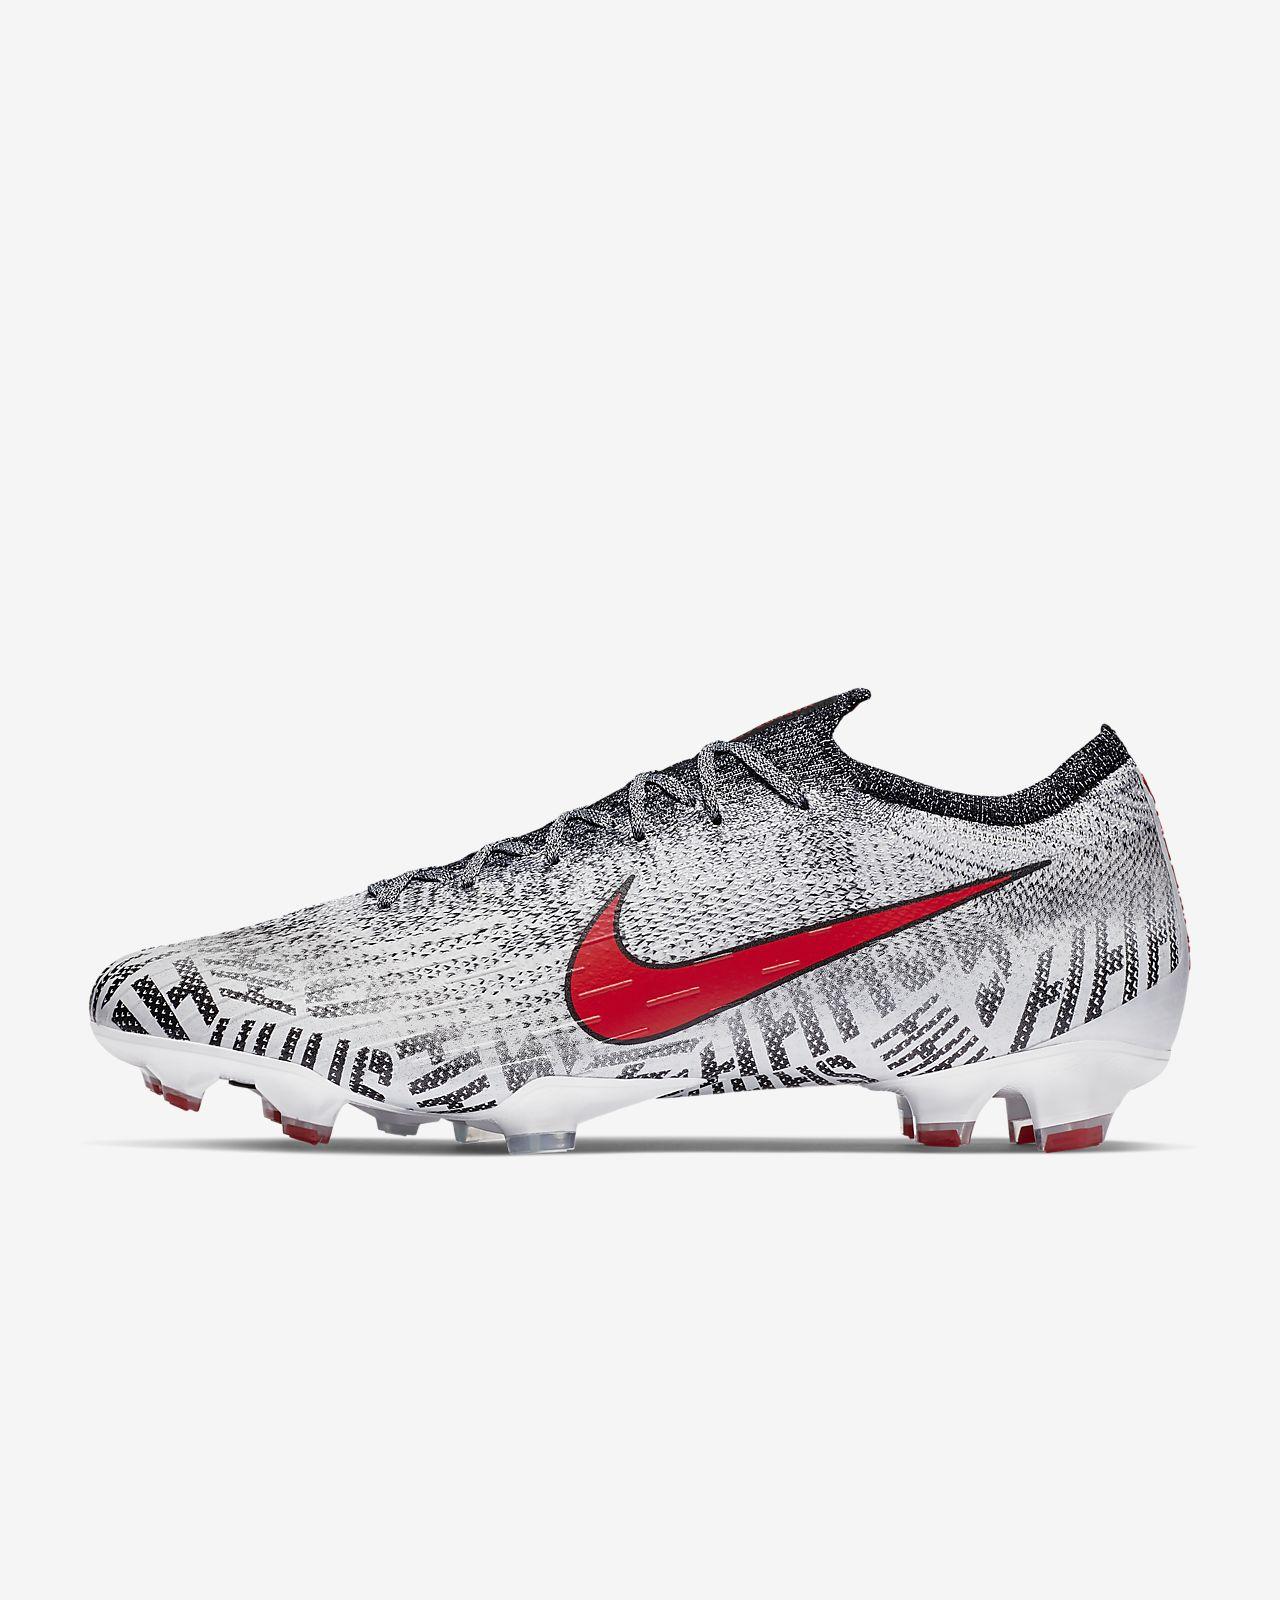 premium selection 86fdb 3c513 ... Calzado de fútbol para terreno firme Nike Mercurial Vapor 360 Elite  Neymar Jr